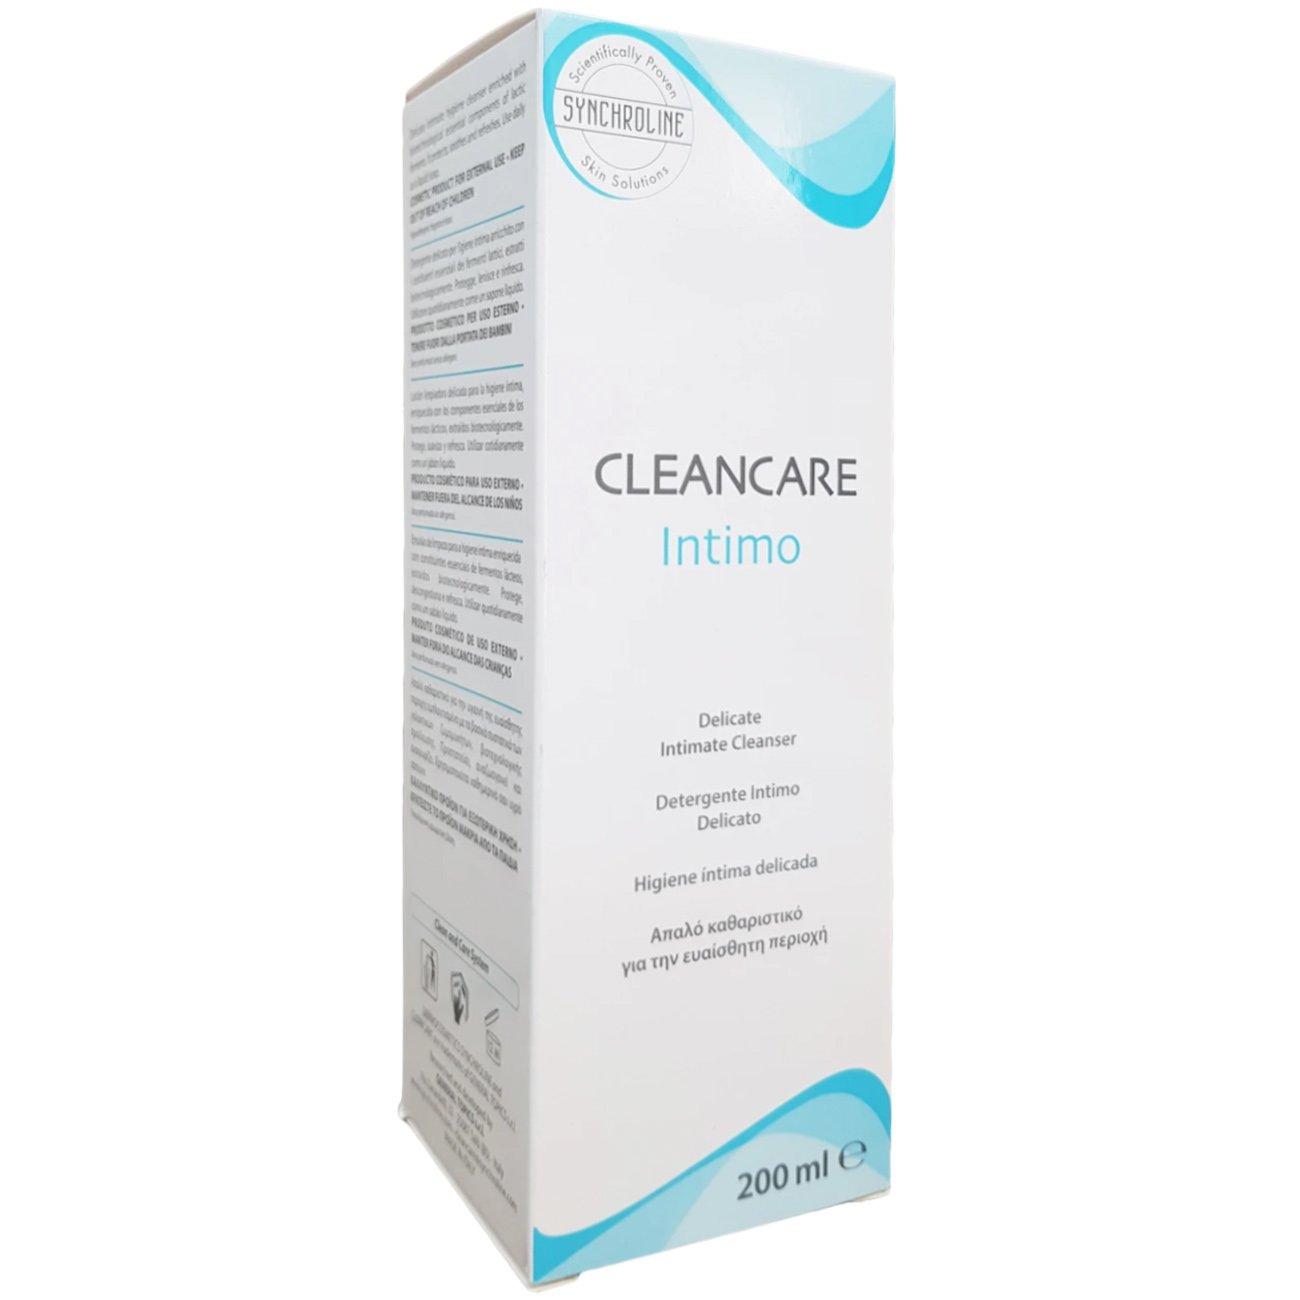 Synchroline Cleancare Intimo Cleanser pH4,5 Απαλό Καθαριστικό Σώματος με Πλούσιο Αφρό 200ml